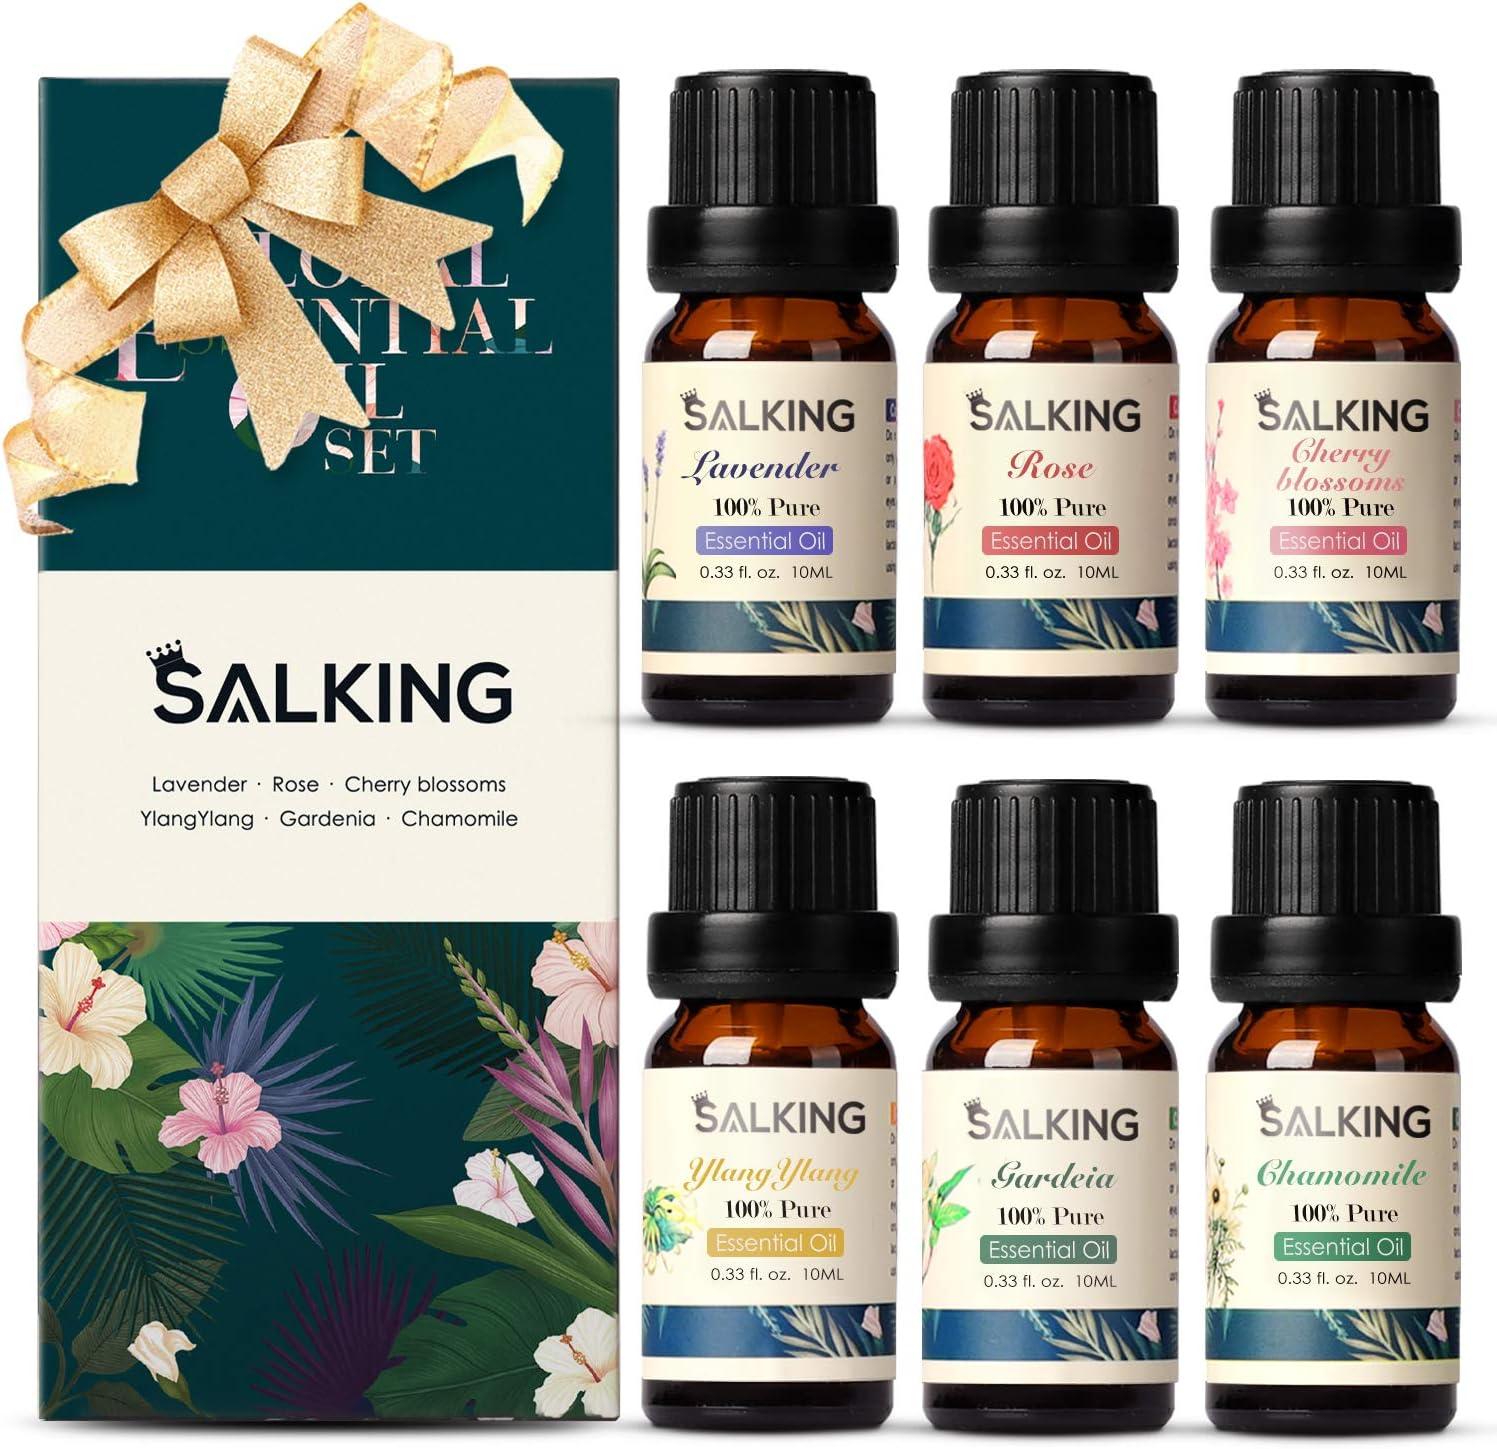 SALKING Aceites Esenciales Naturales para Humidificador,6 x 10 ml Flores Aceites Esenciales Aromaterapia 100% Puro Natural-Lavanda,Rosa, Flor de cerezo, Ylang Ylang, Gardenia, Manzanilla